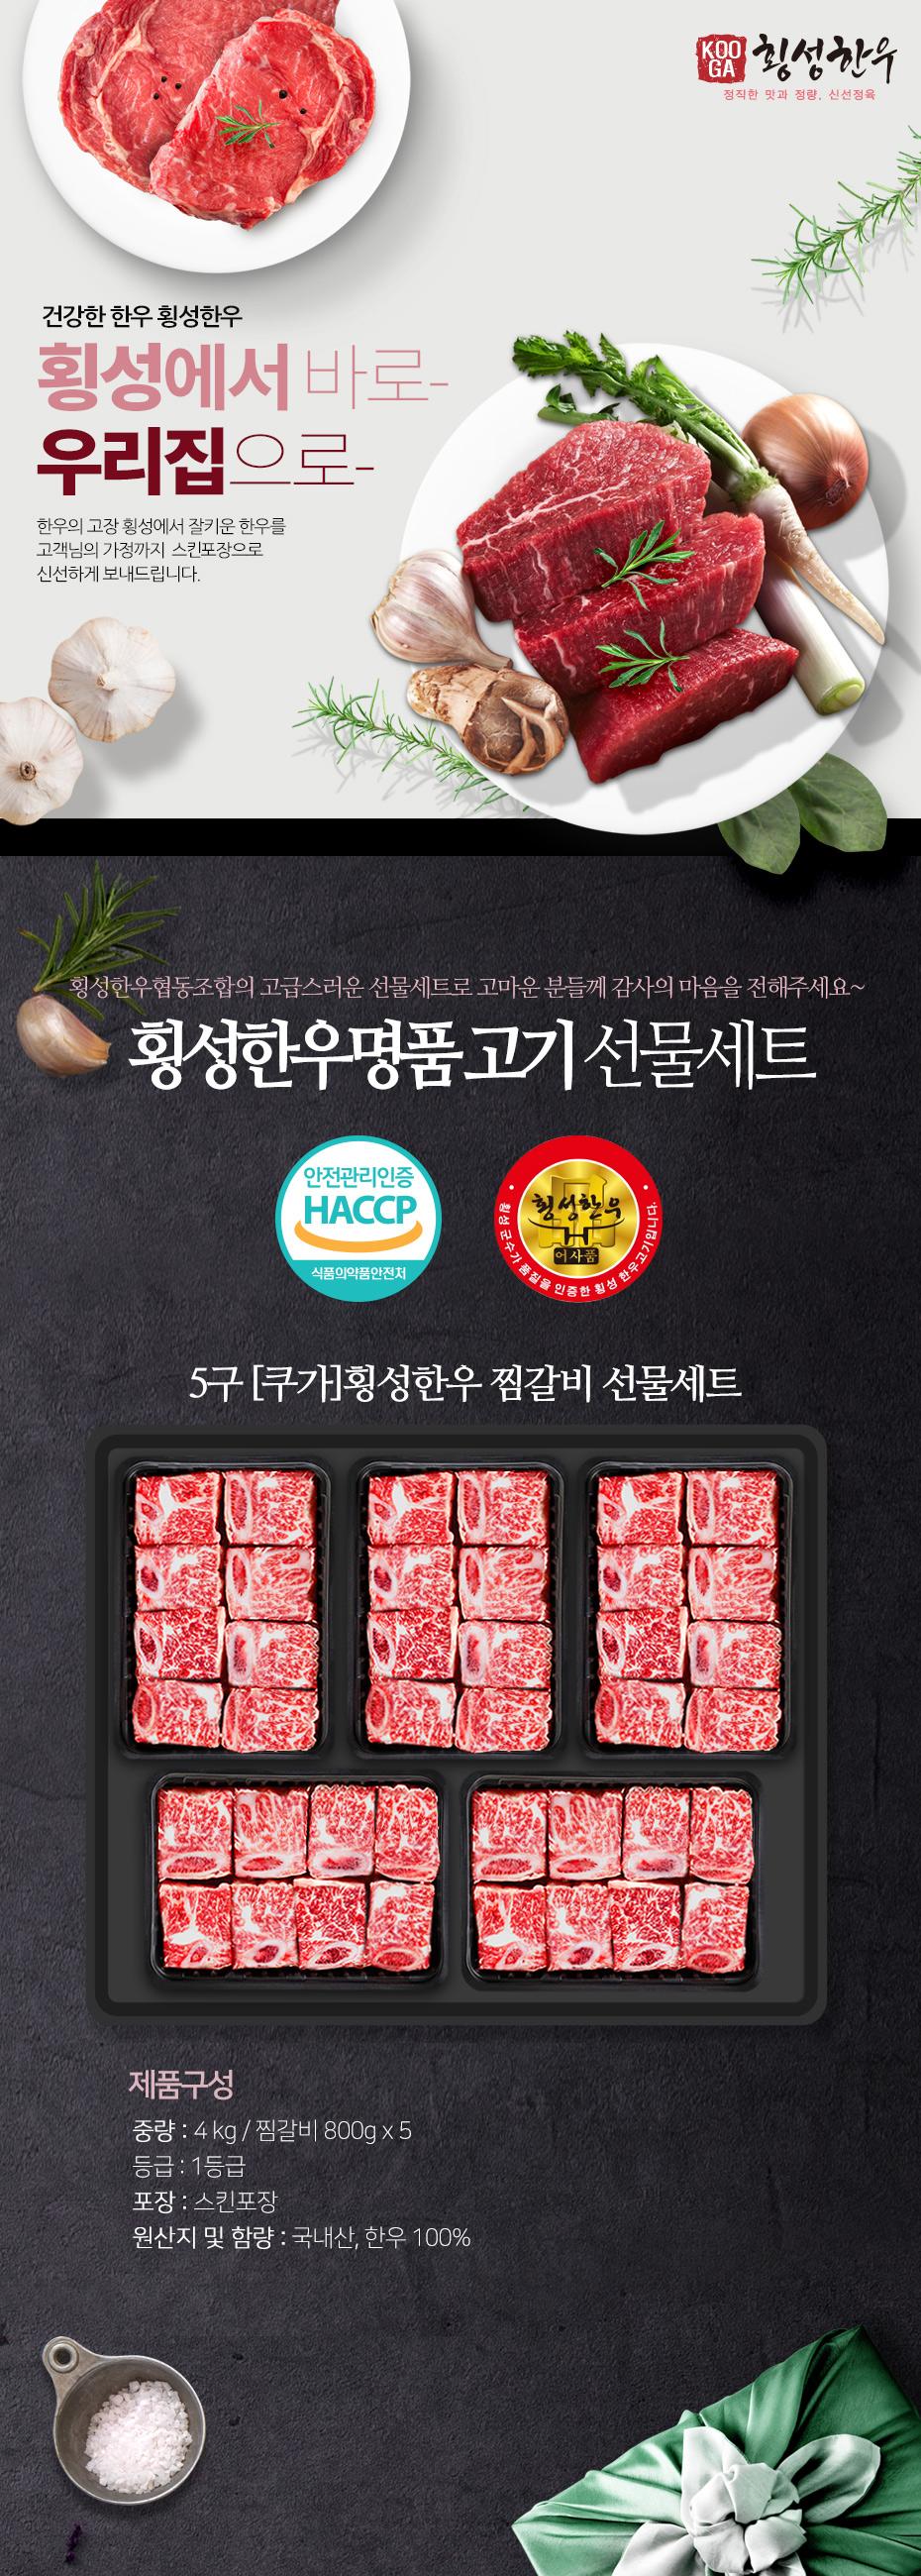 set5_meat_rib5_231958.jpg